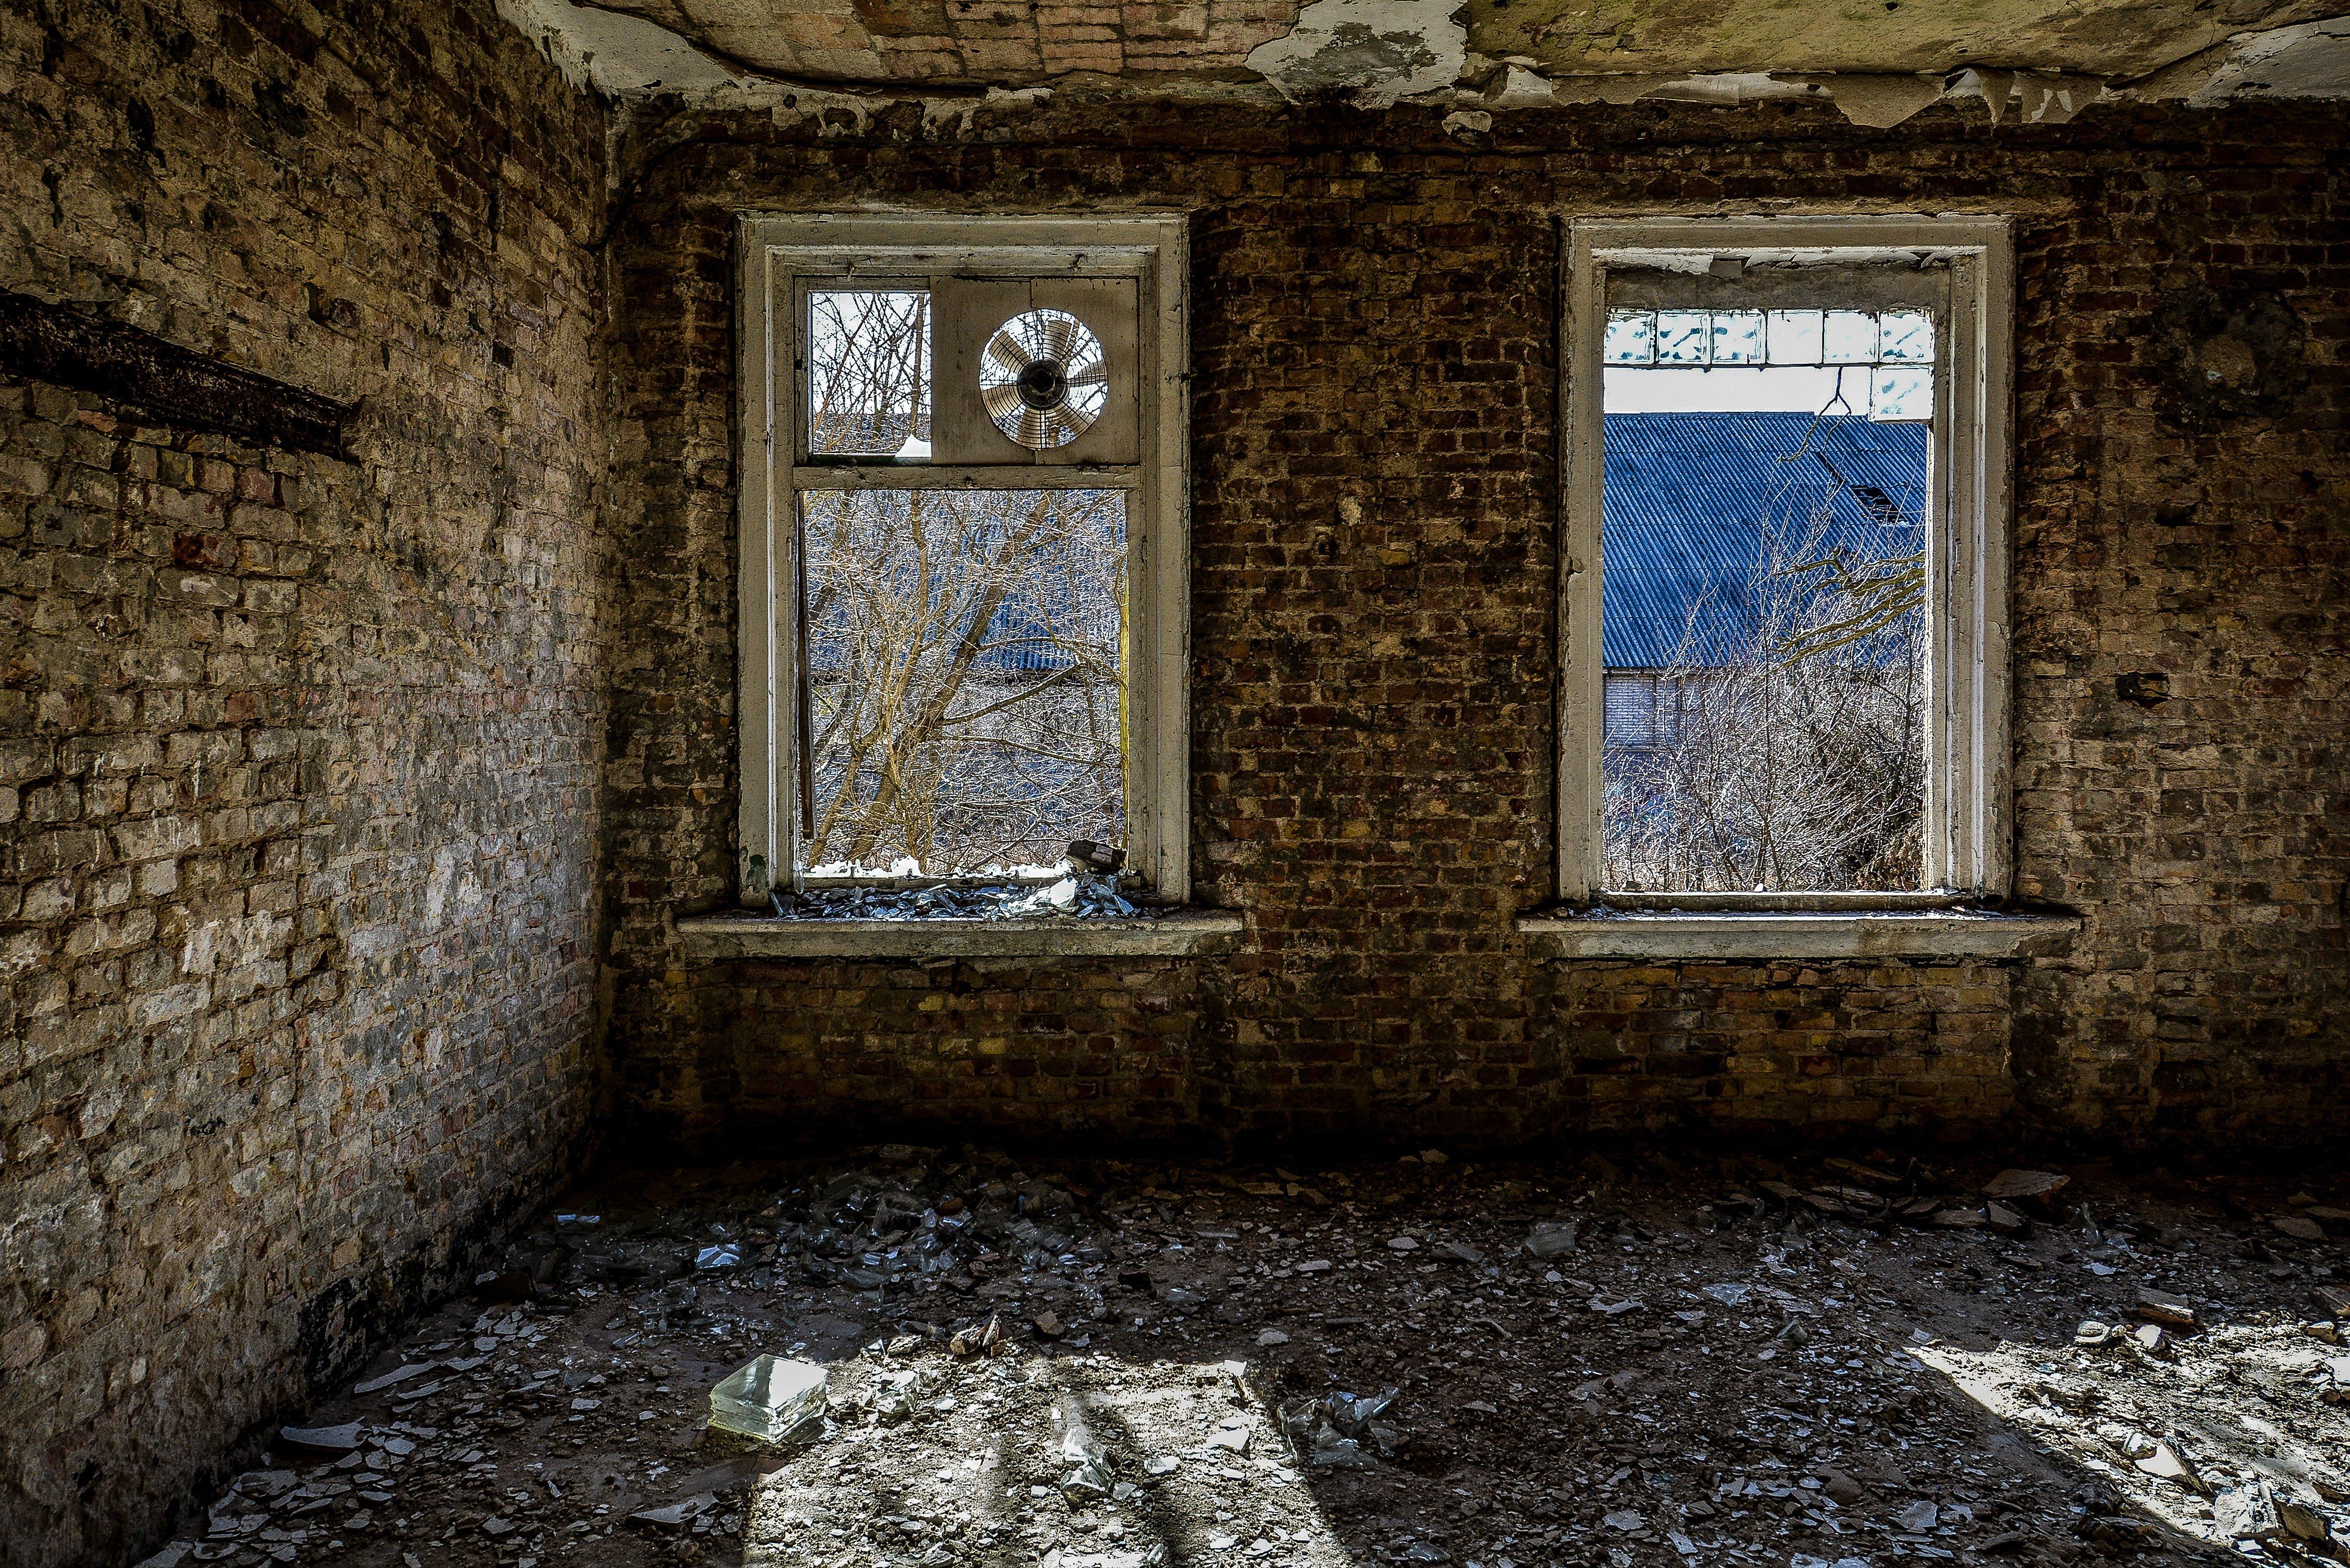 window fan nazi soviet military base abandoned urbex urban exploring loewen adler kaserne elstal wustermark roter stern kaserne germany lost places